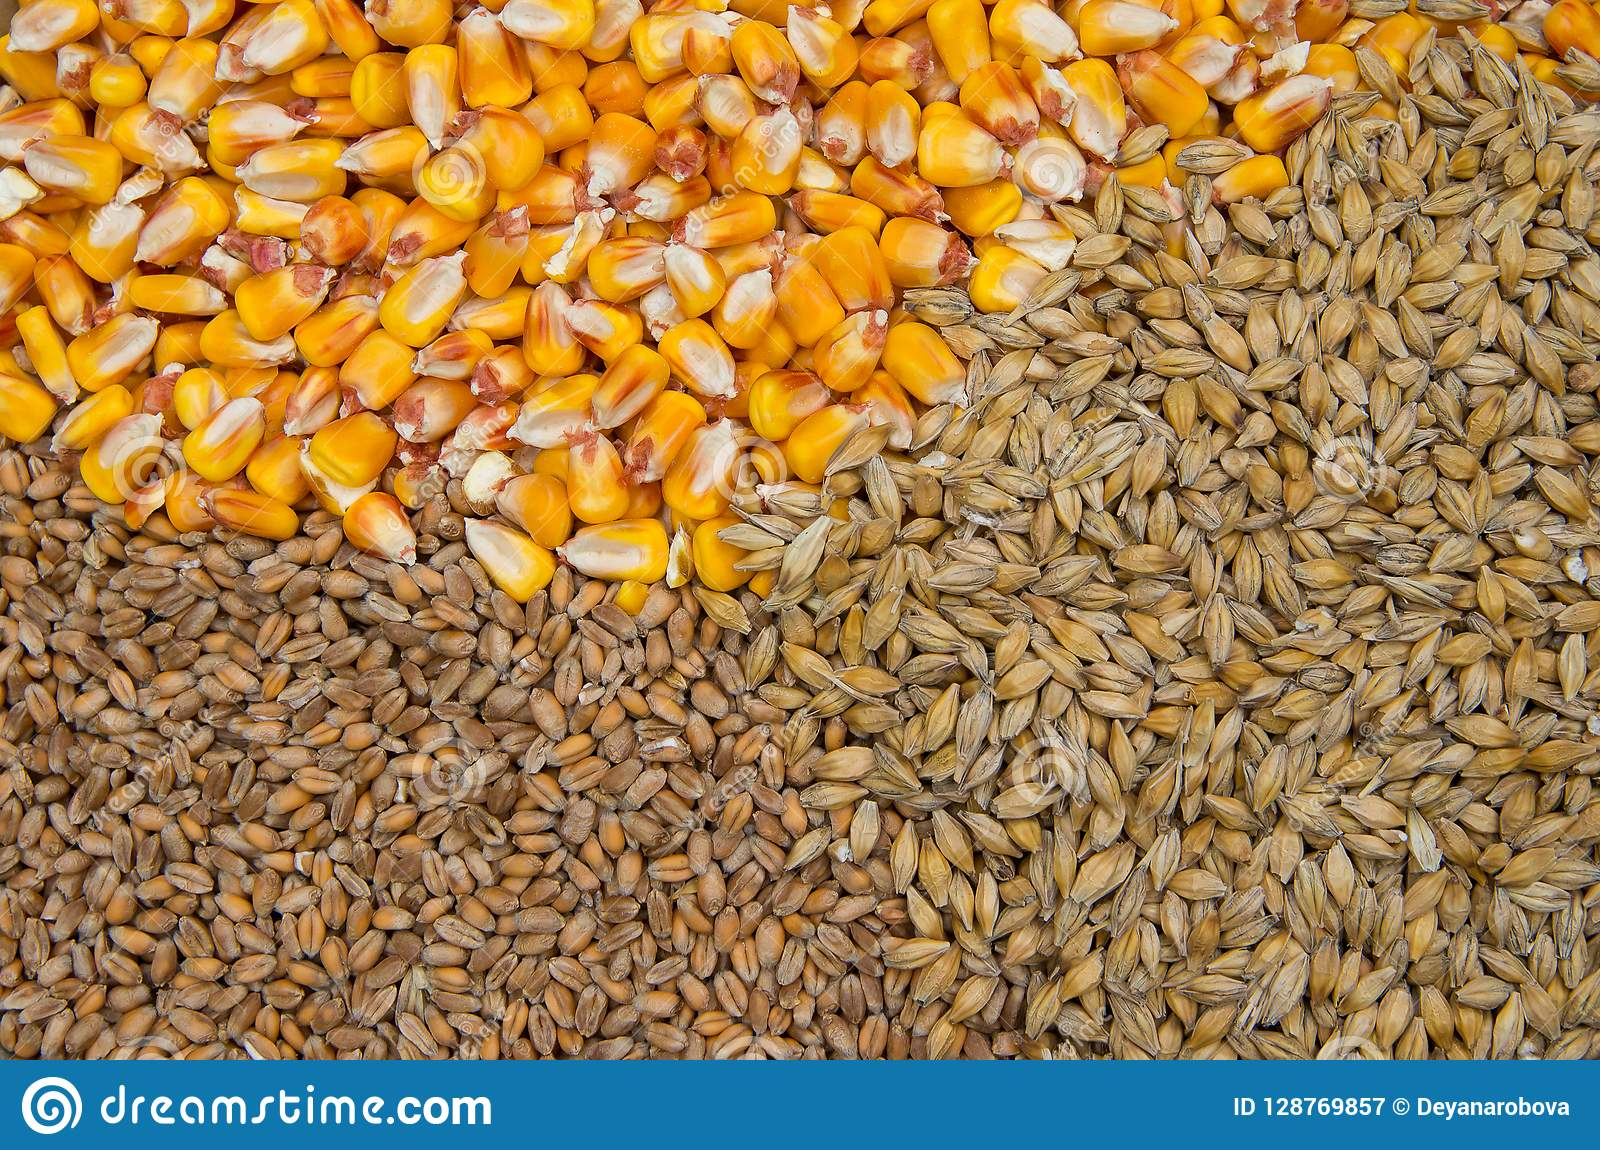 Wheat, barley and maize